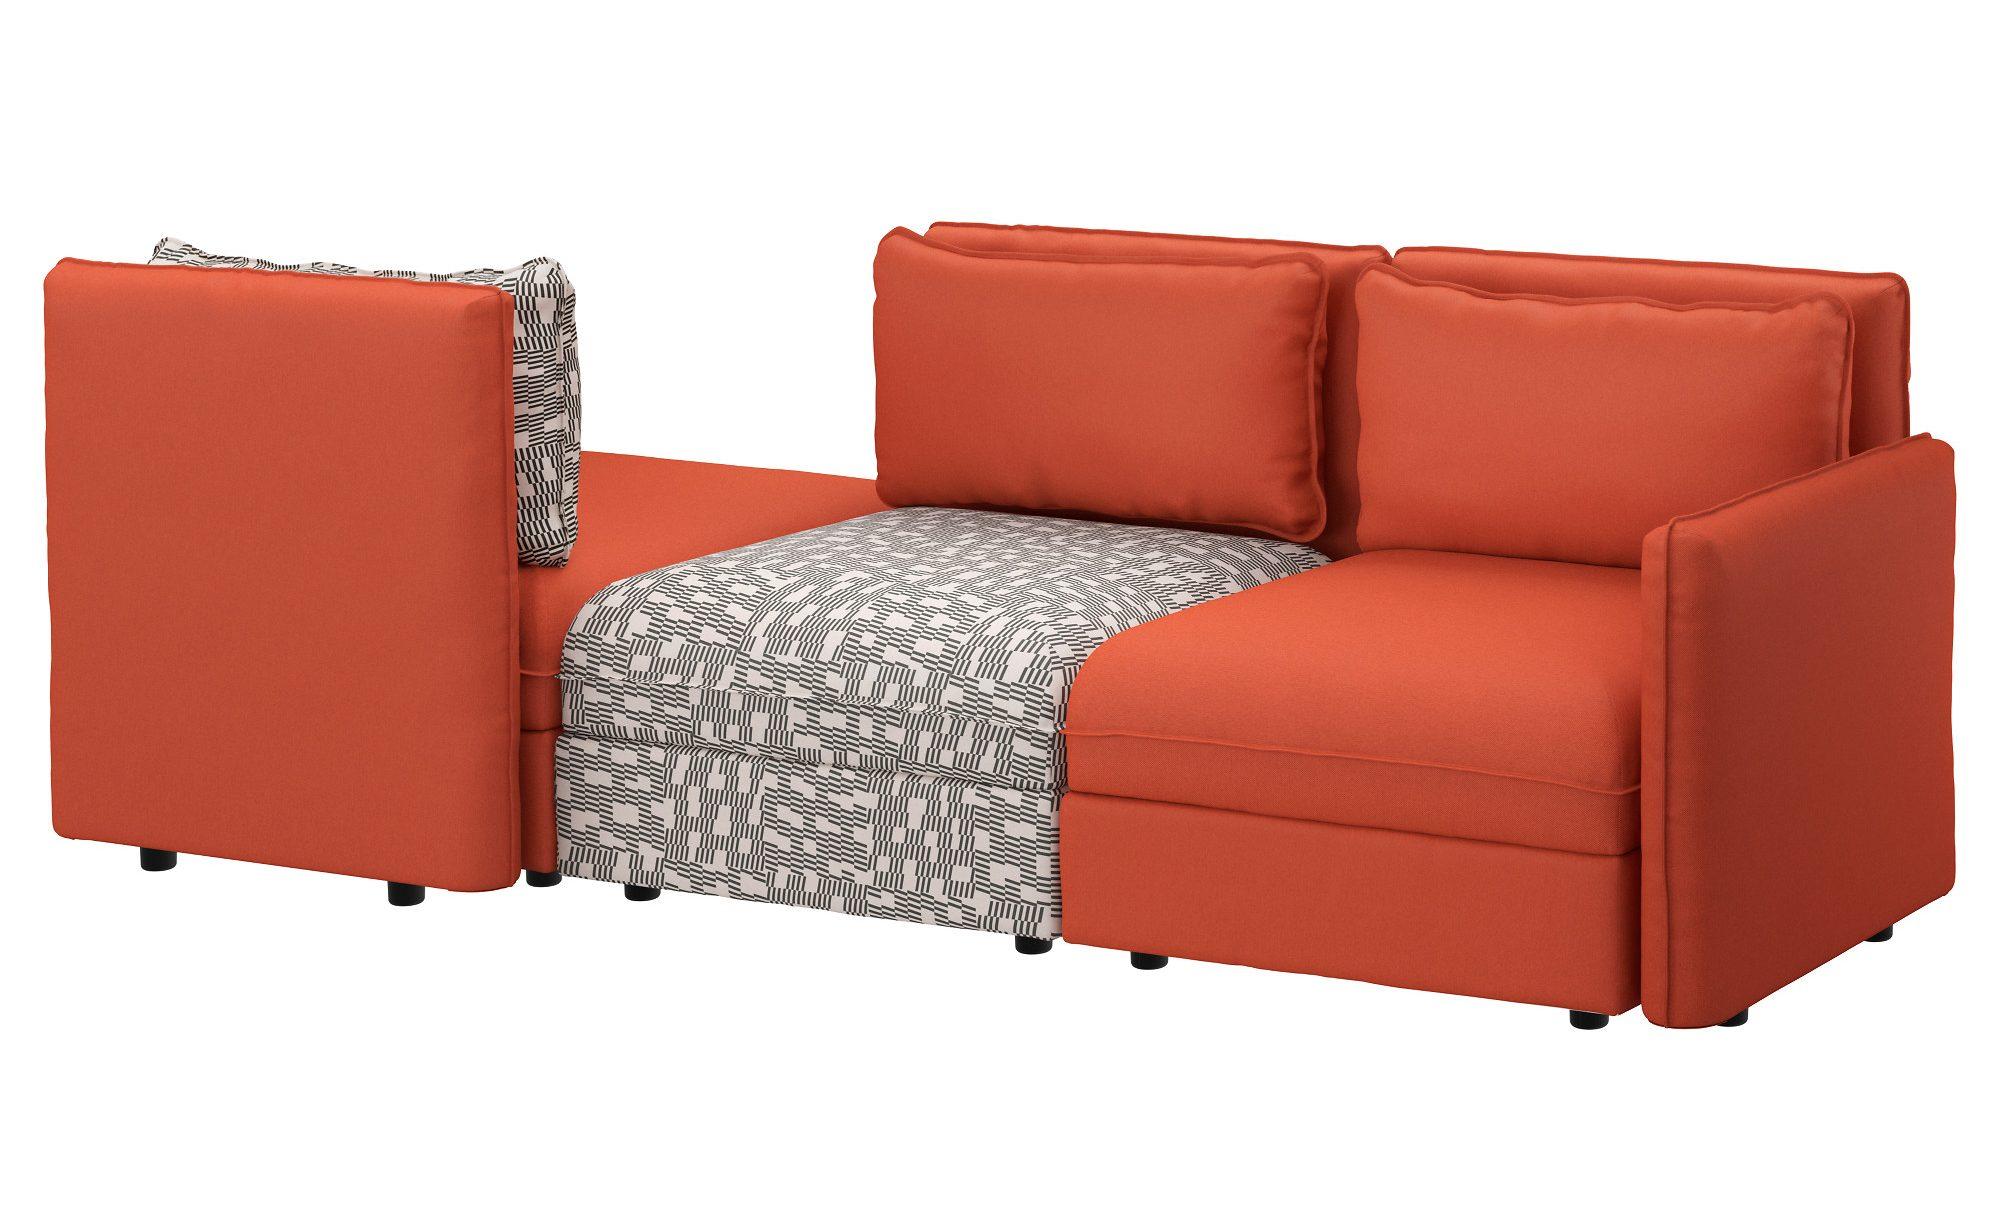 Ikea Vallentuna Sofa Review Something